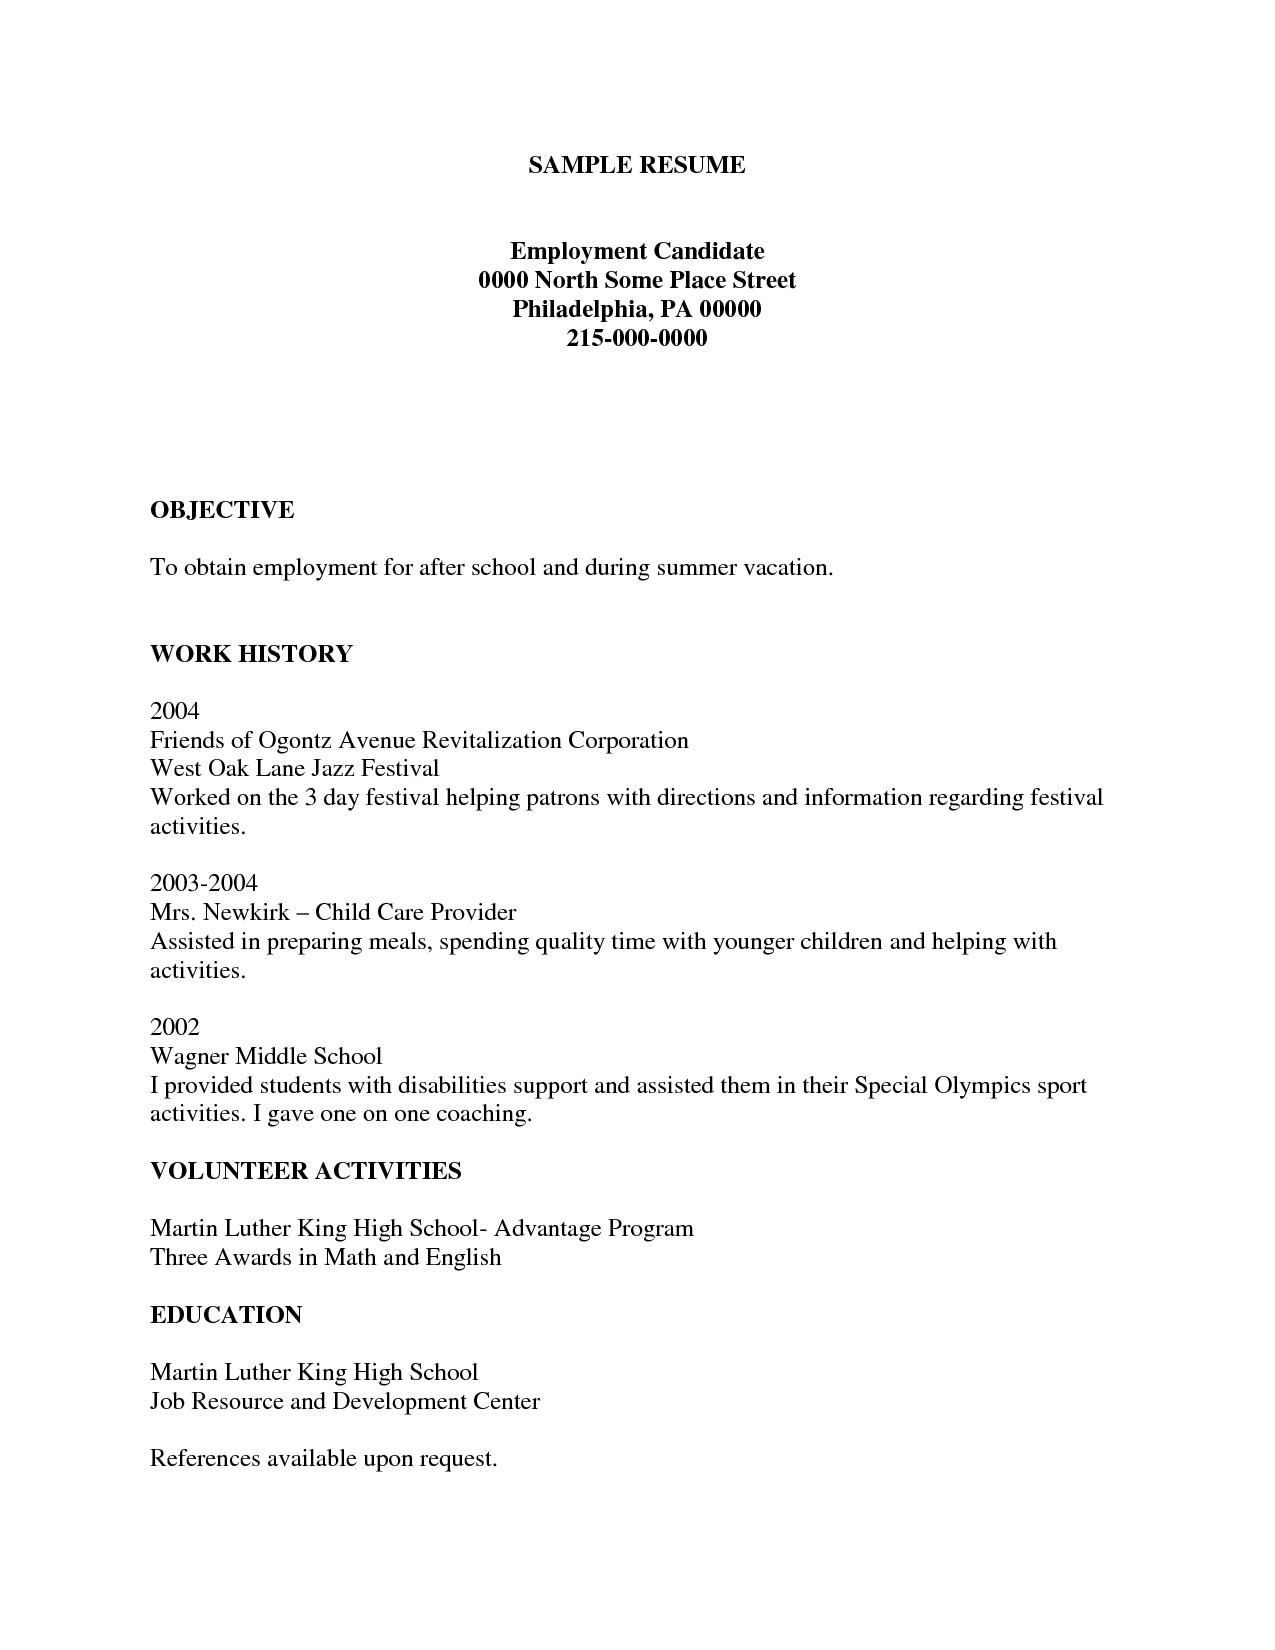 Create A Free Printable Resume | Resume Template Info - Free Printable Resume